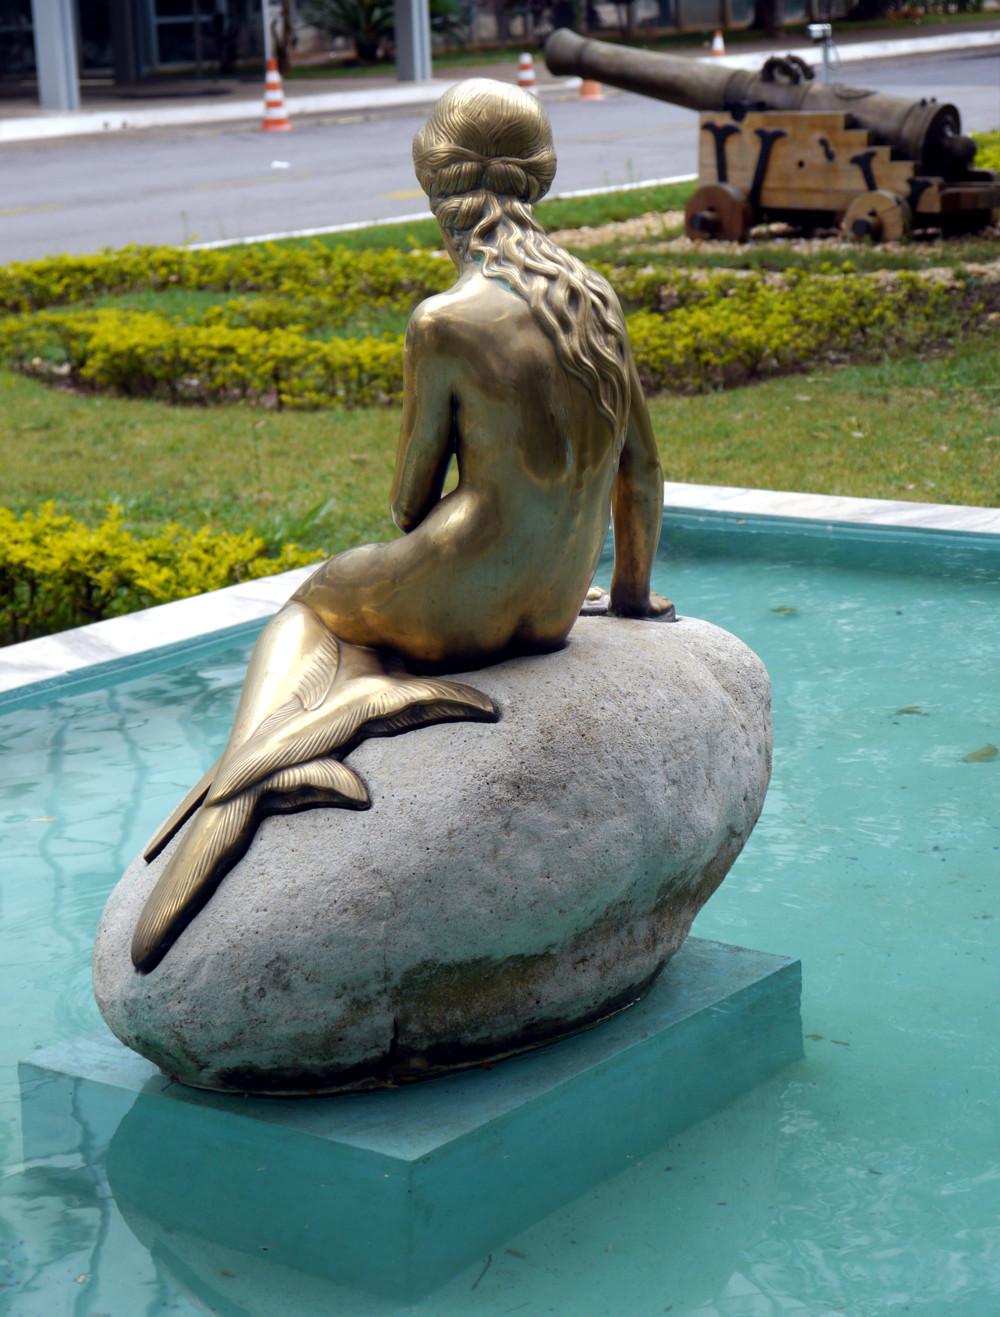 Brazilian Navy's The Little Mermaid